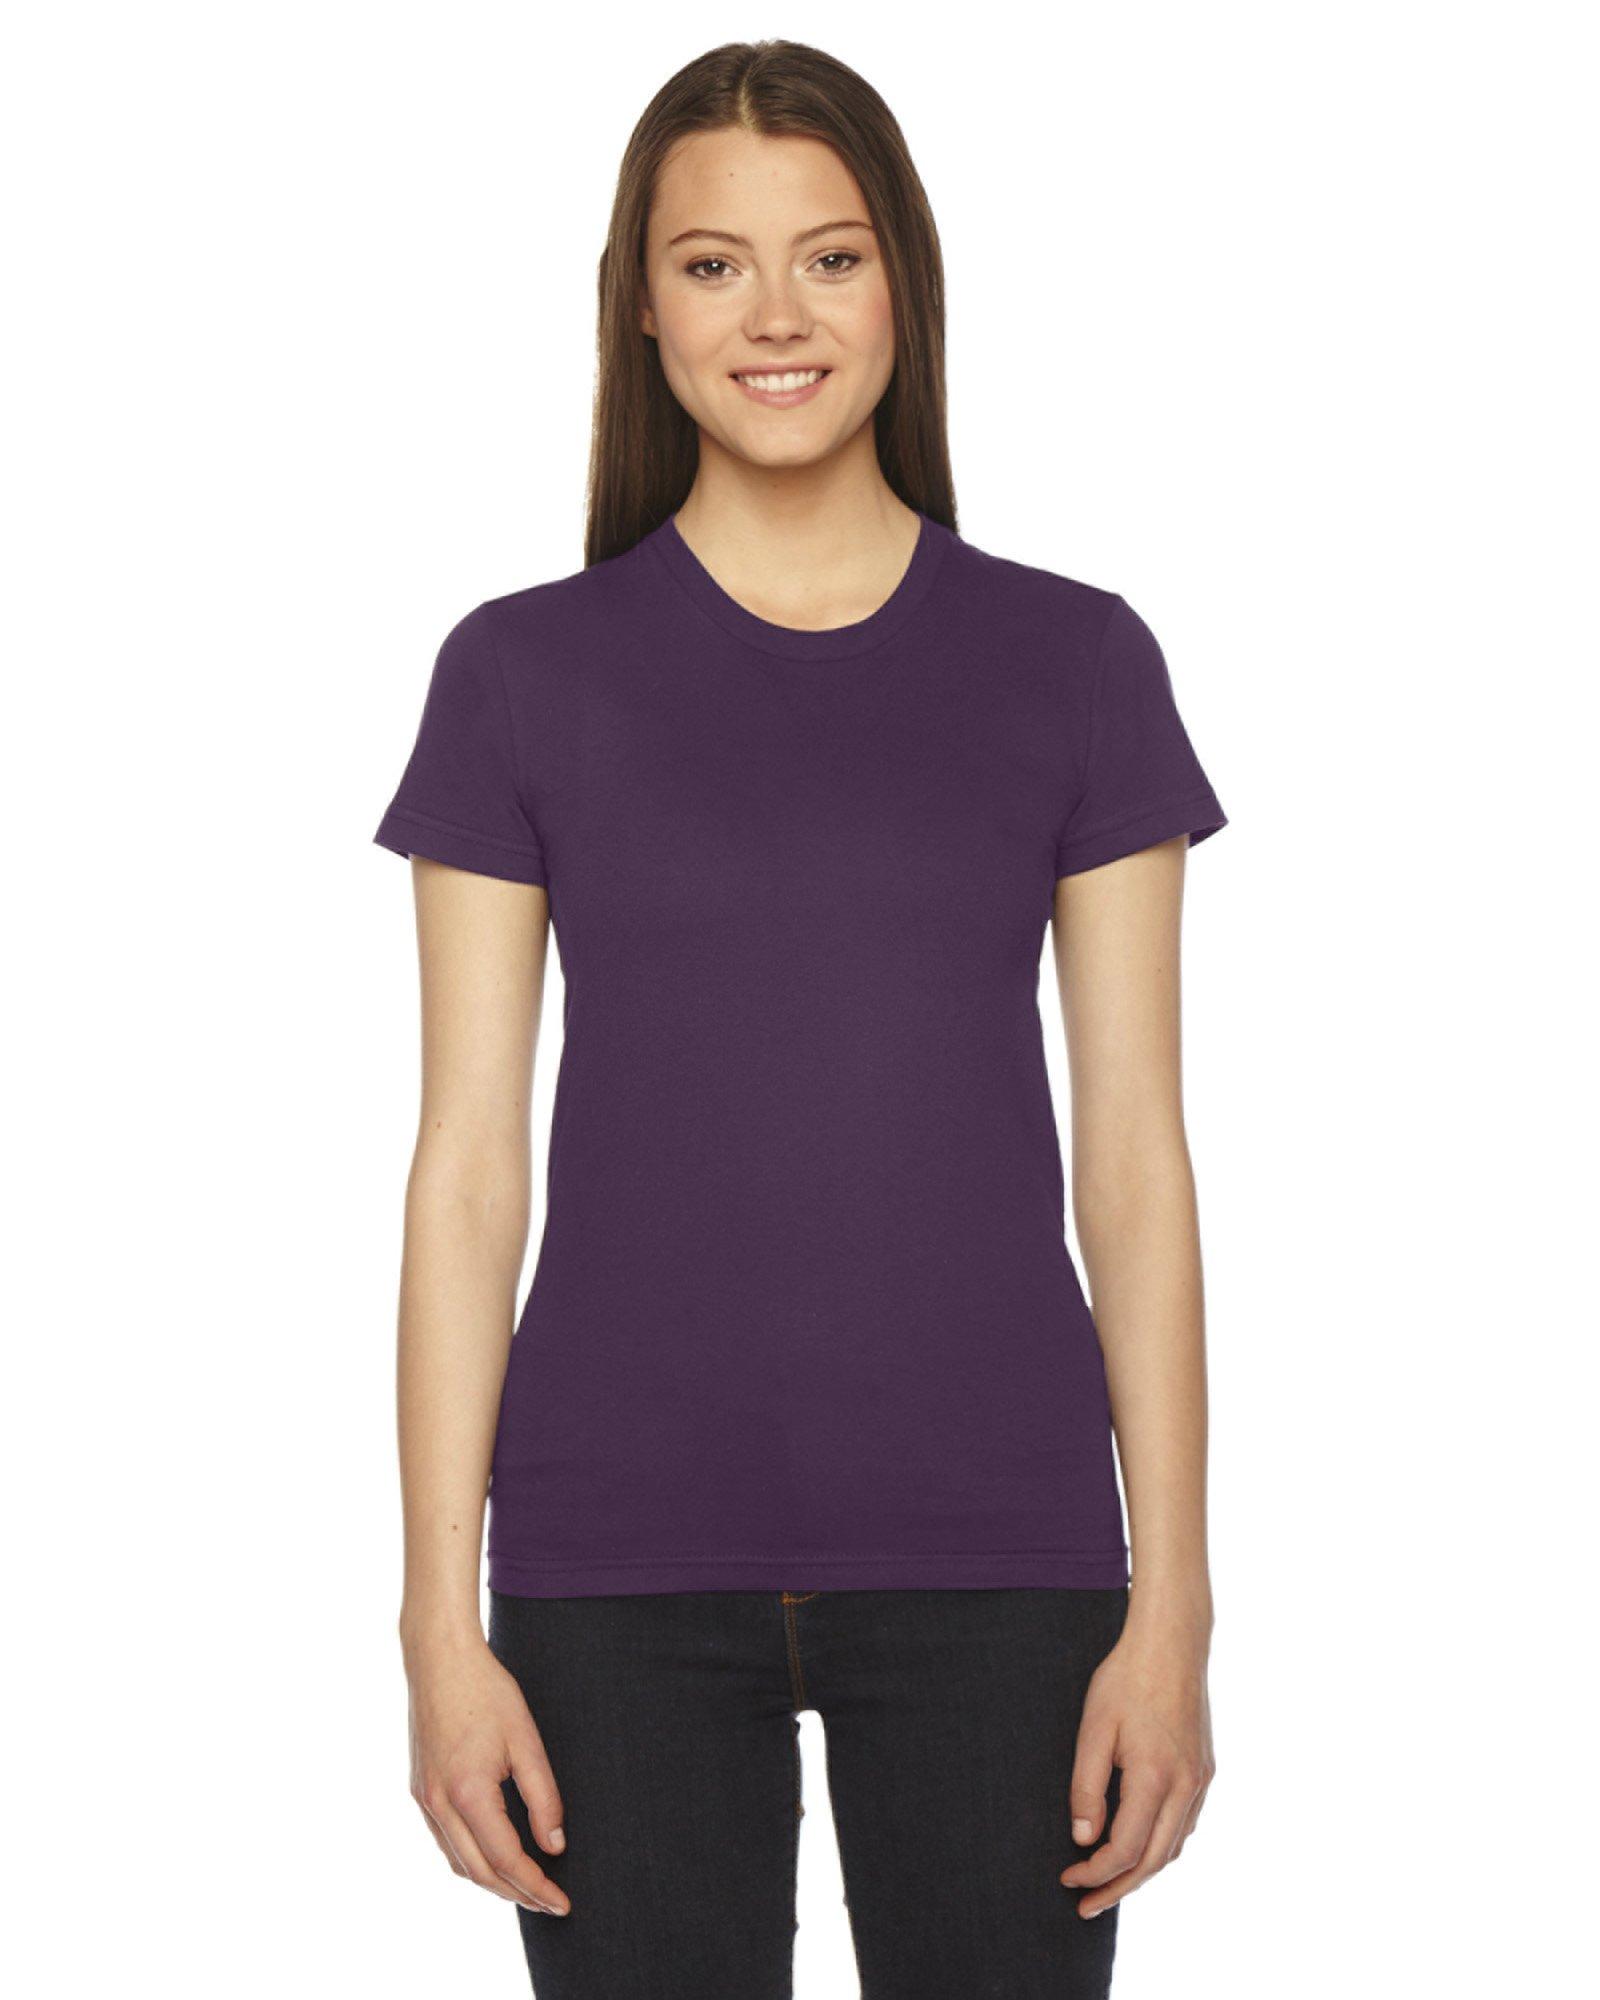 American Apparel Women's Fine Jersey Short Sleeve T-Shirt - Eggplant - Large